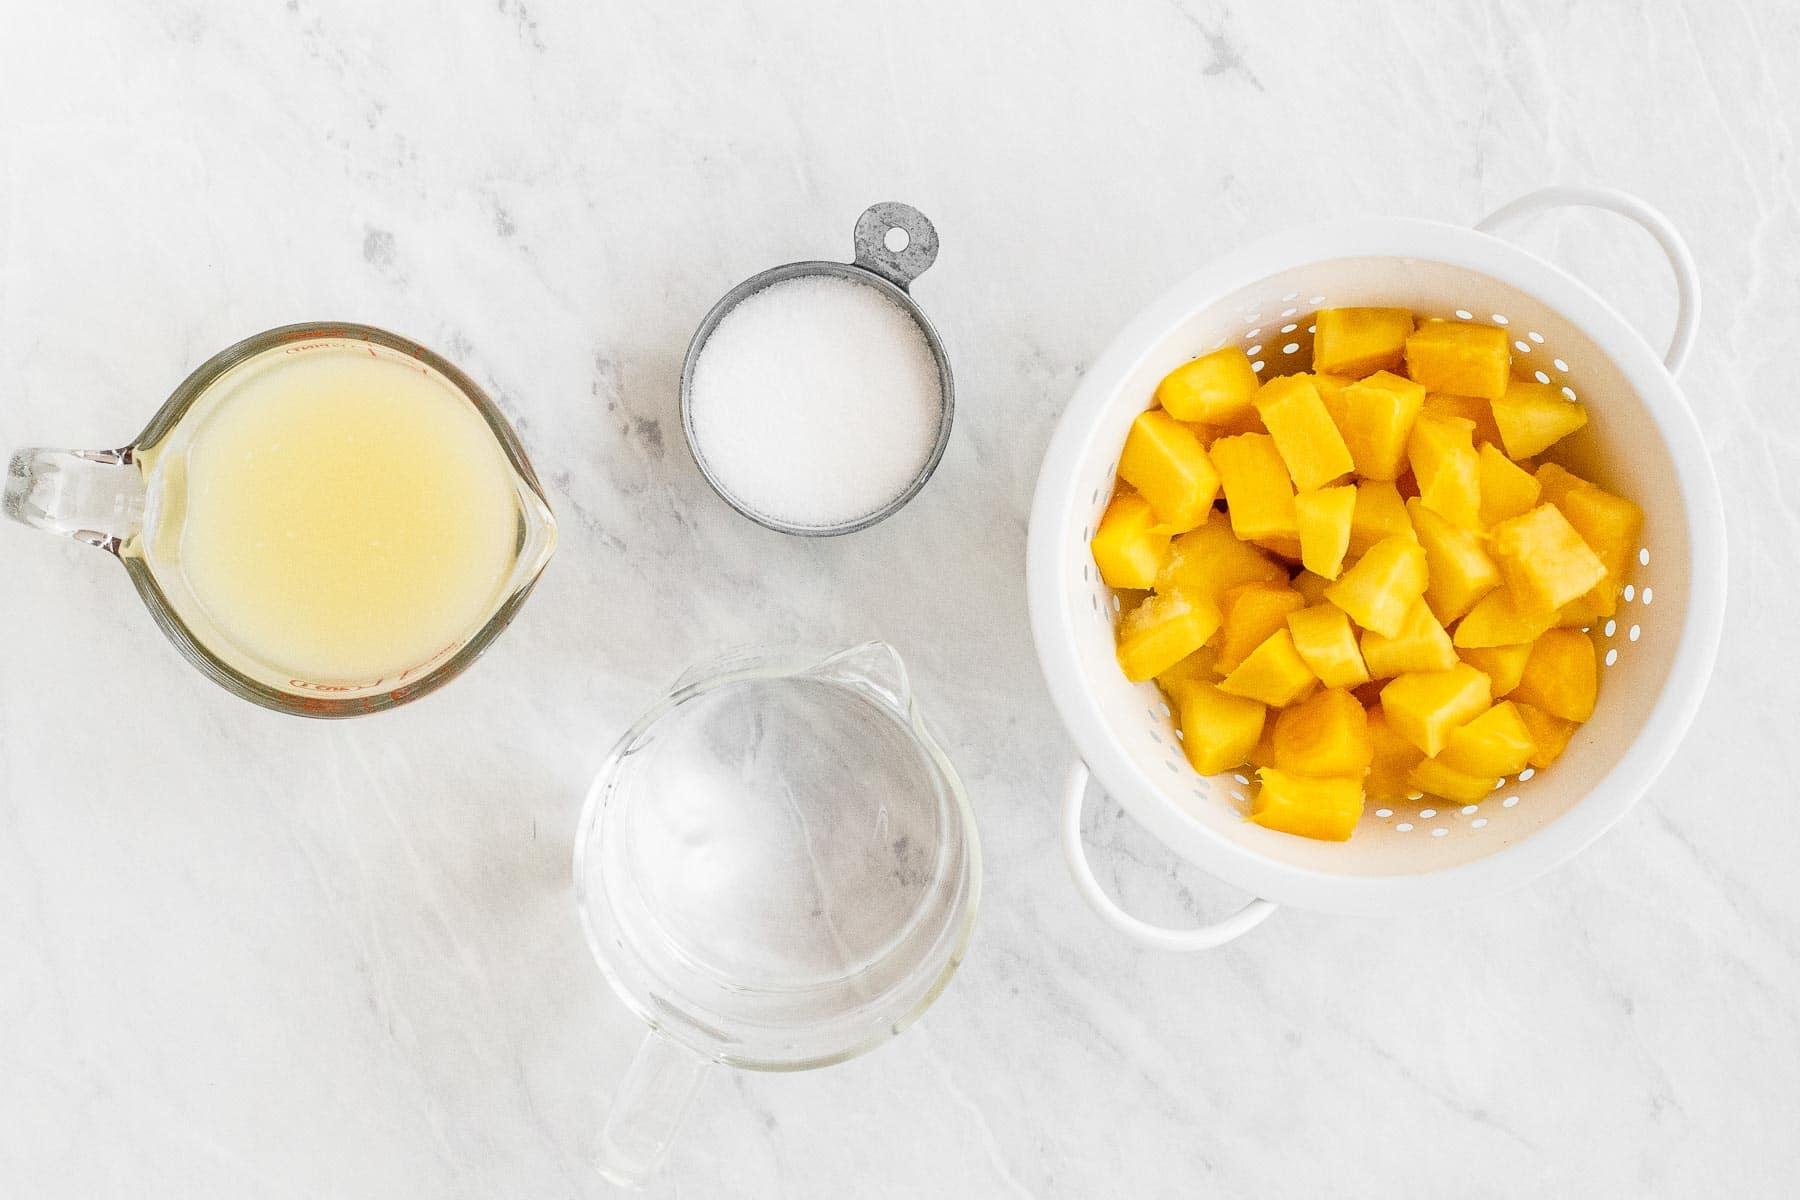 Ingredients for mango lemonade on white table.